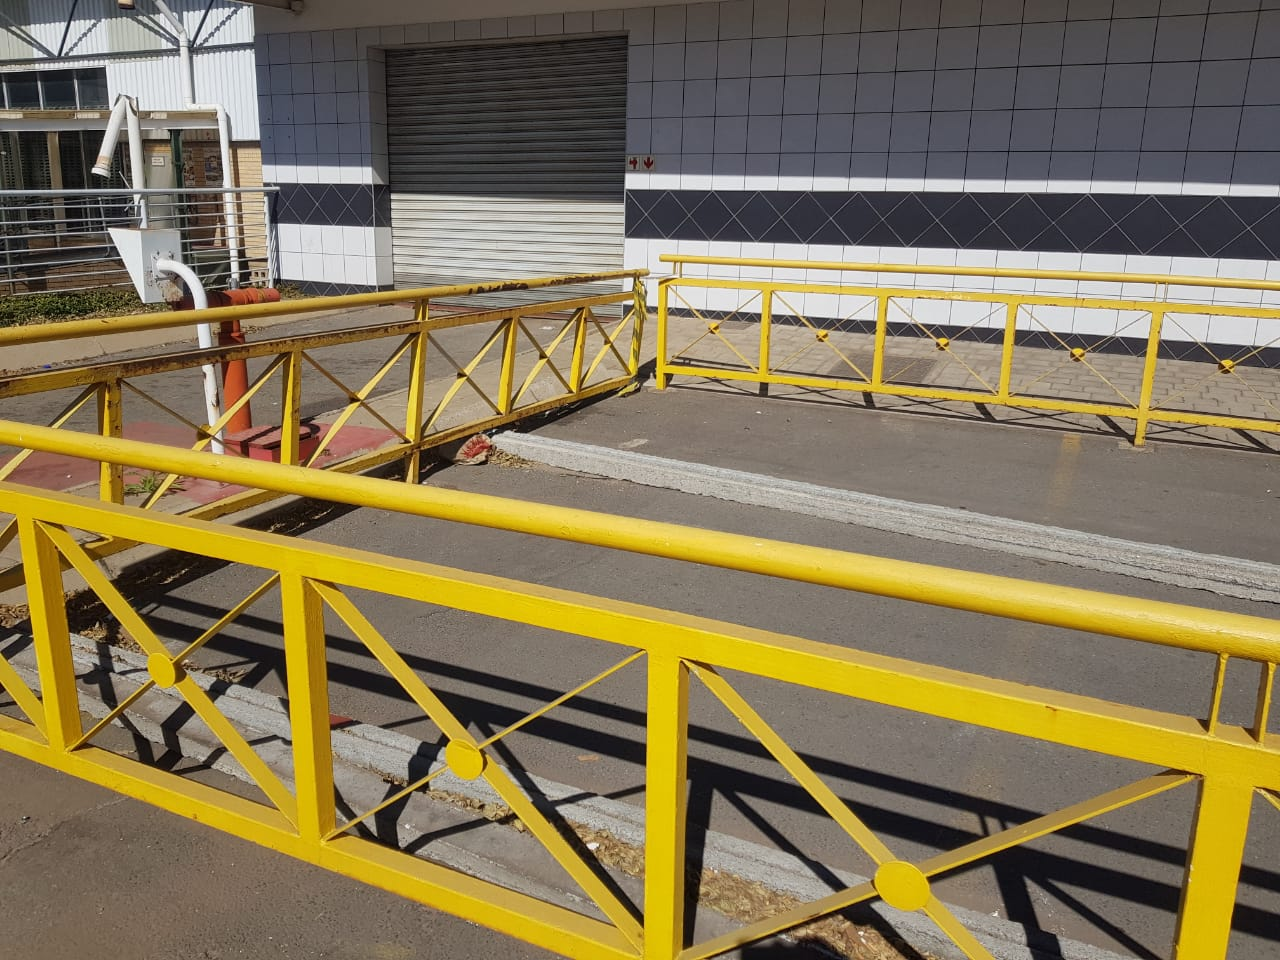 STEEL BALUSTRADE FOR SALE 20M LONG